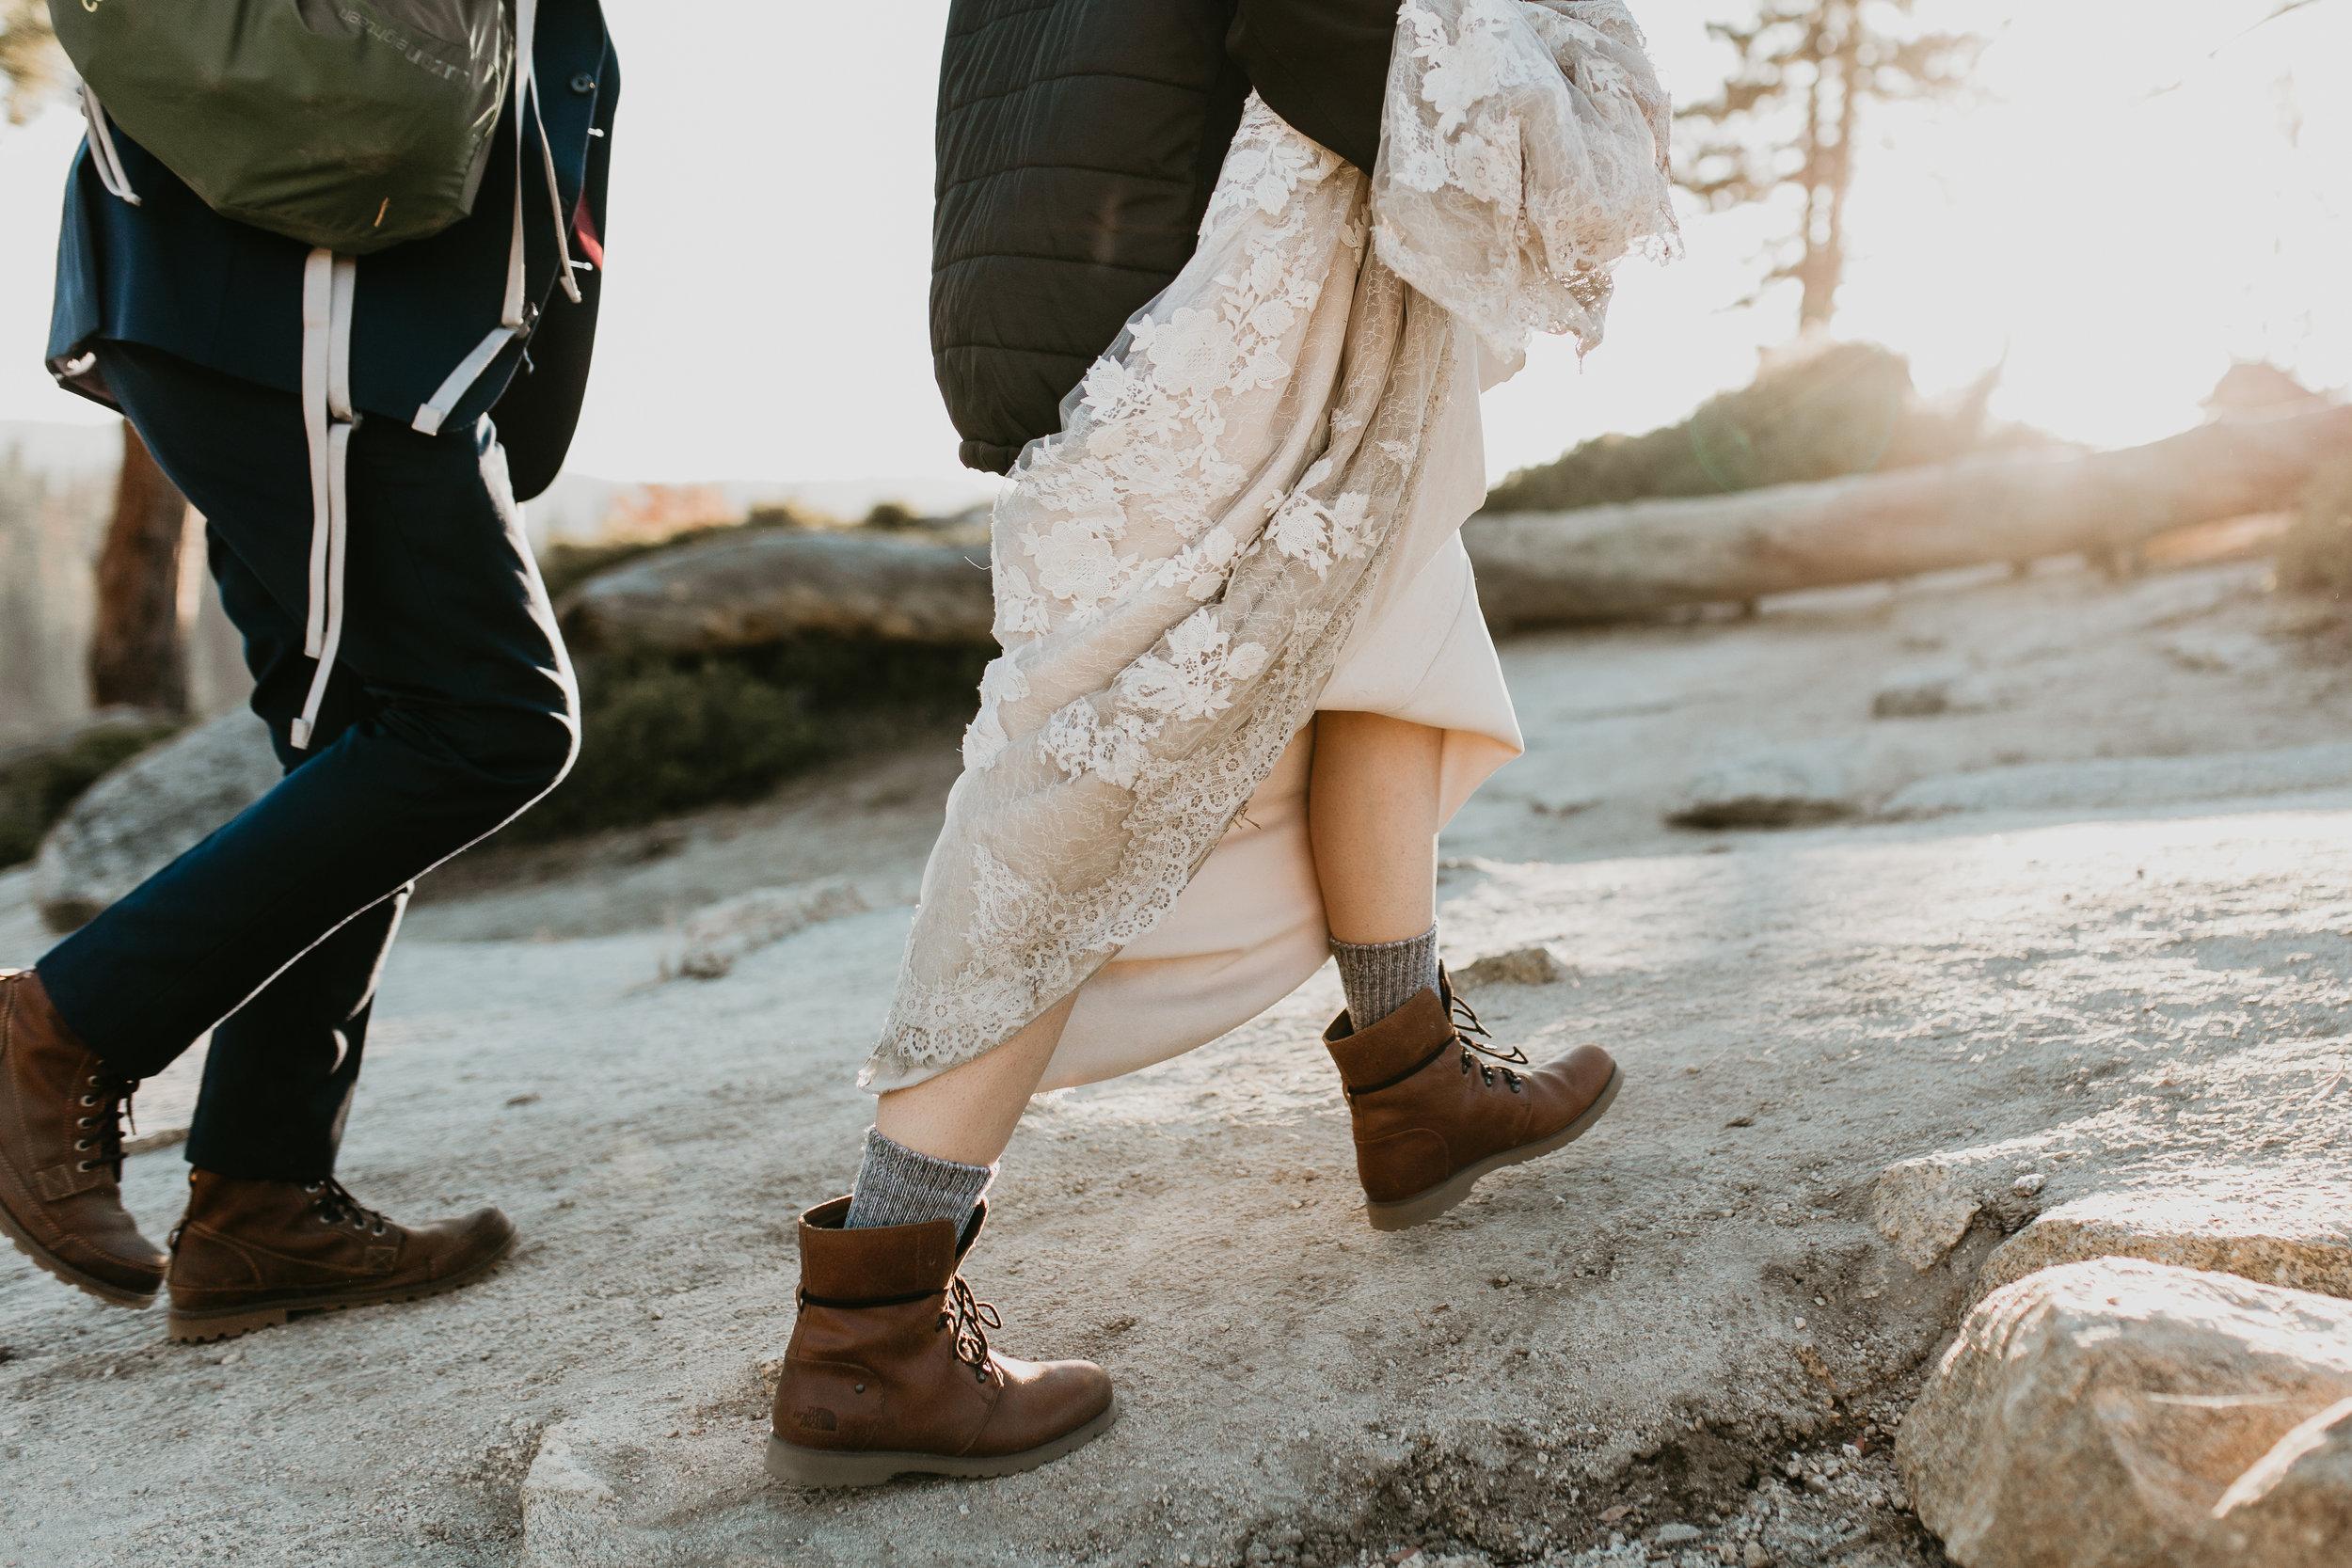 nicole-daacke-photography-yosemite-national-park-elopement-at-taft-point-tunnel-view-yosemite-intimate-wedding-fall-sunset-adventure-elopement-photographer-42.jpg